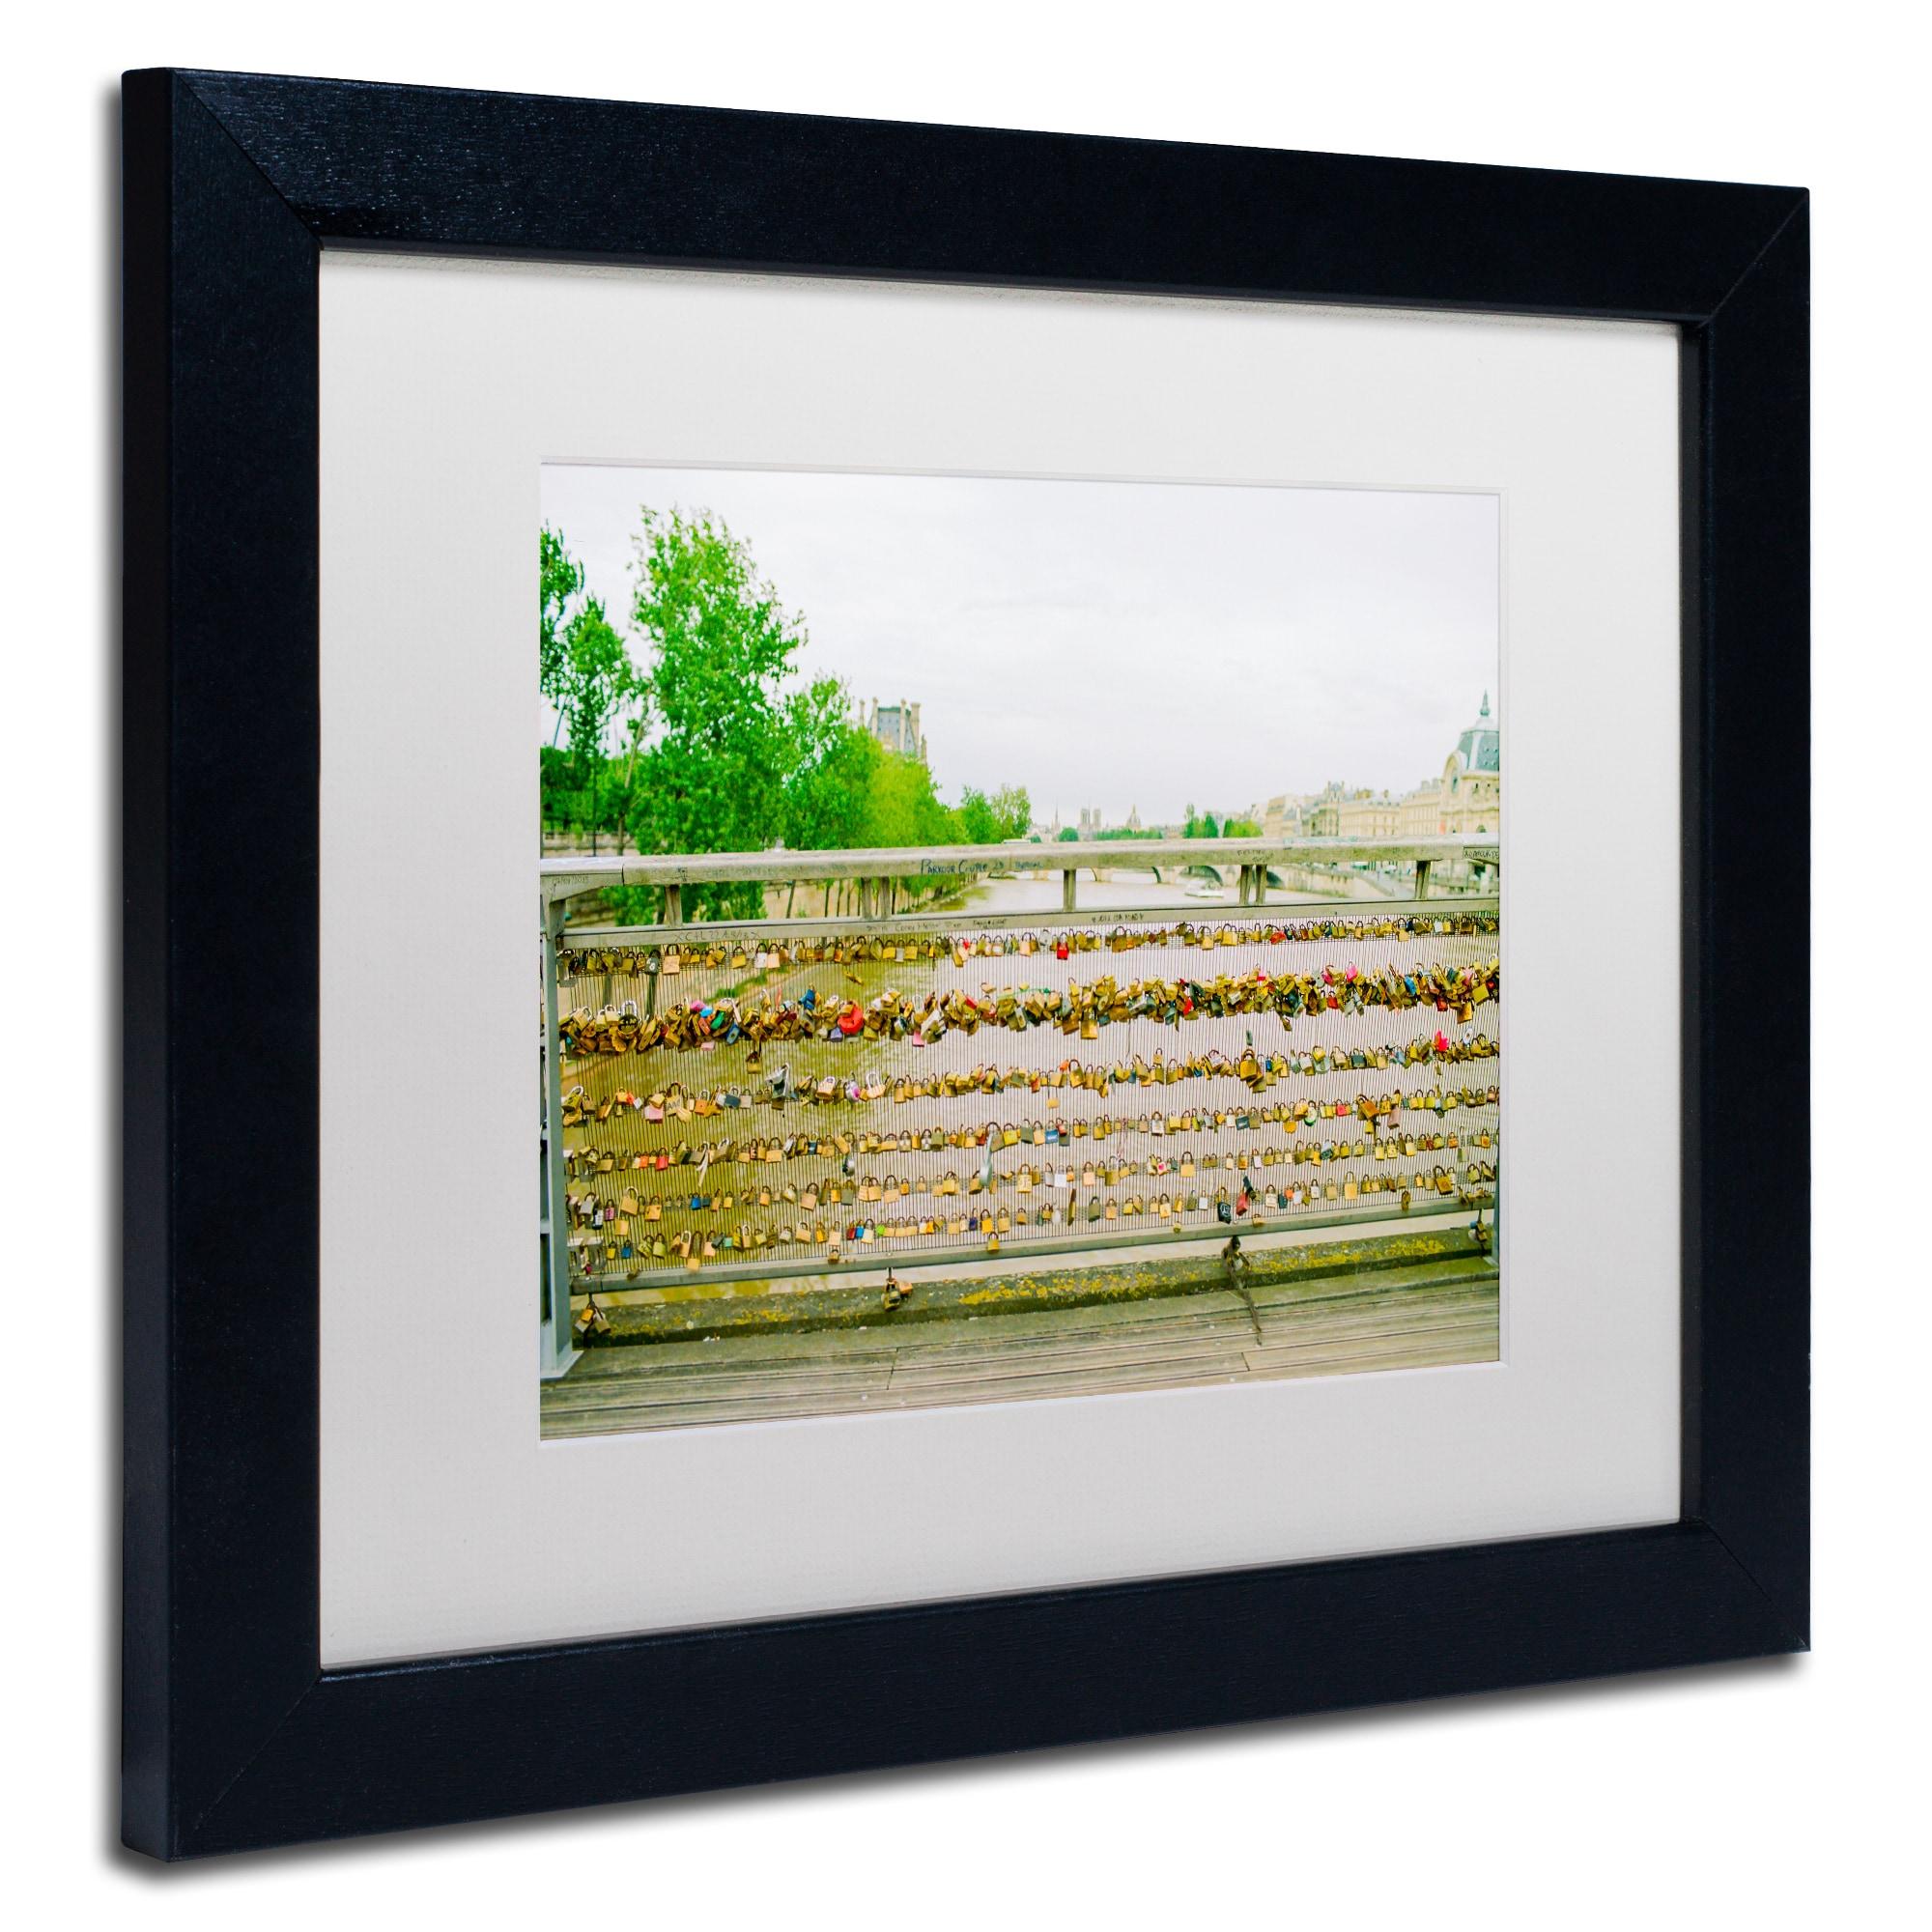 Ariane Moshayedi Paris Locks Love 2 Matted Framed Art Overstock 12385882